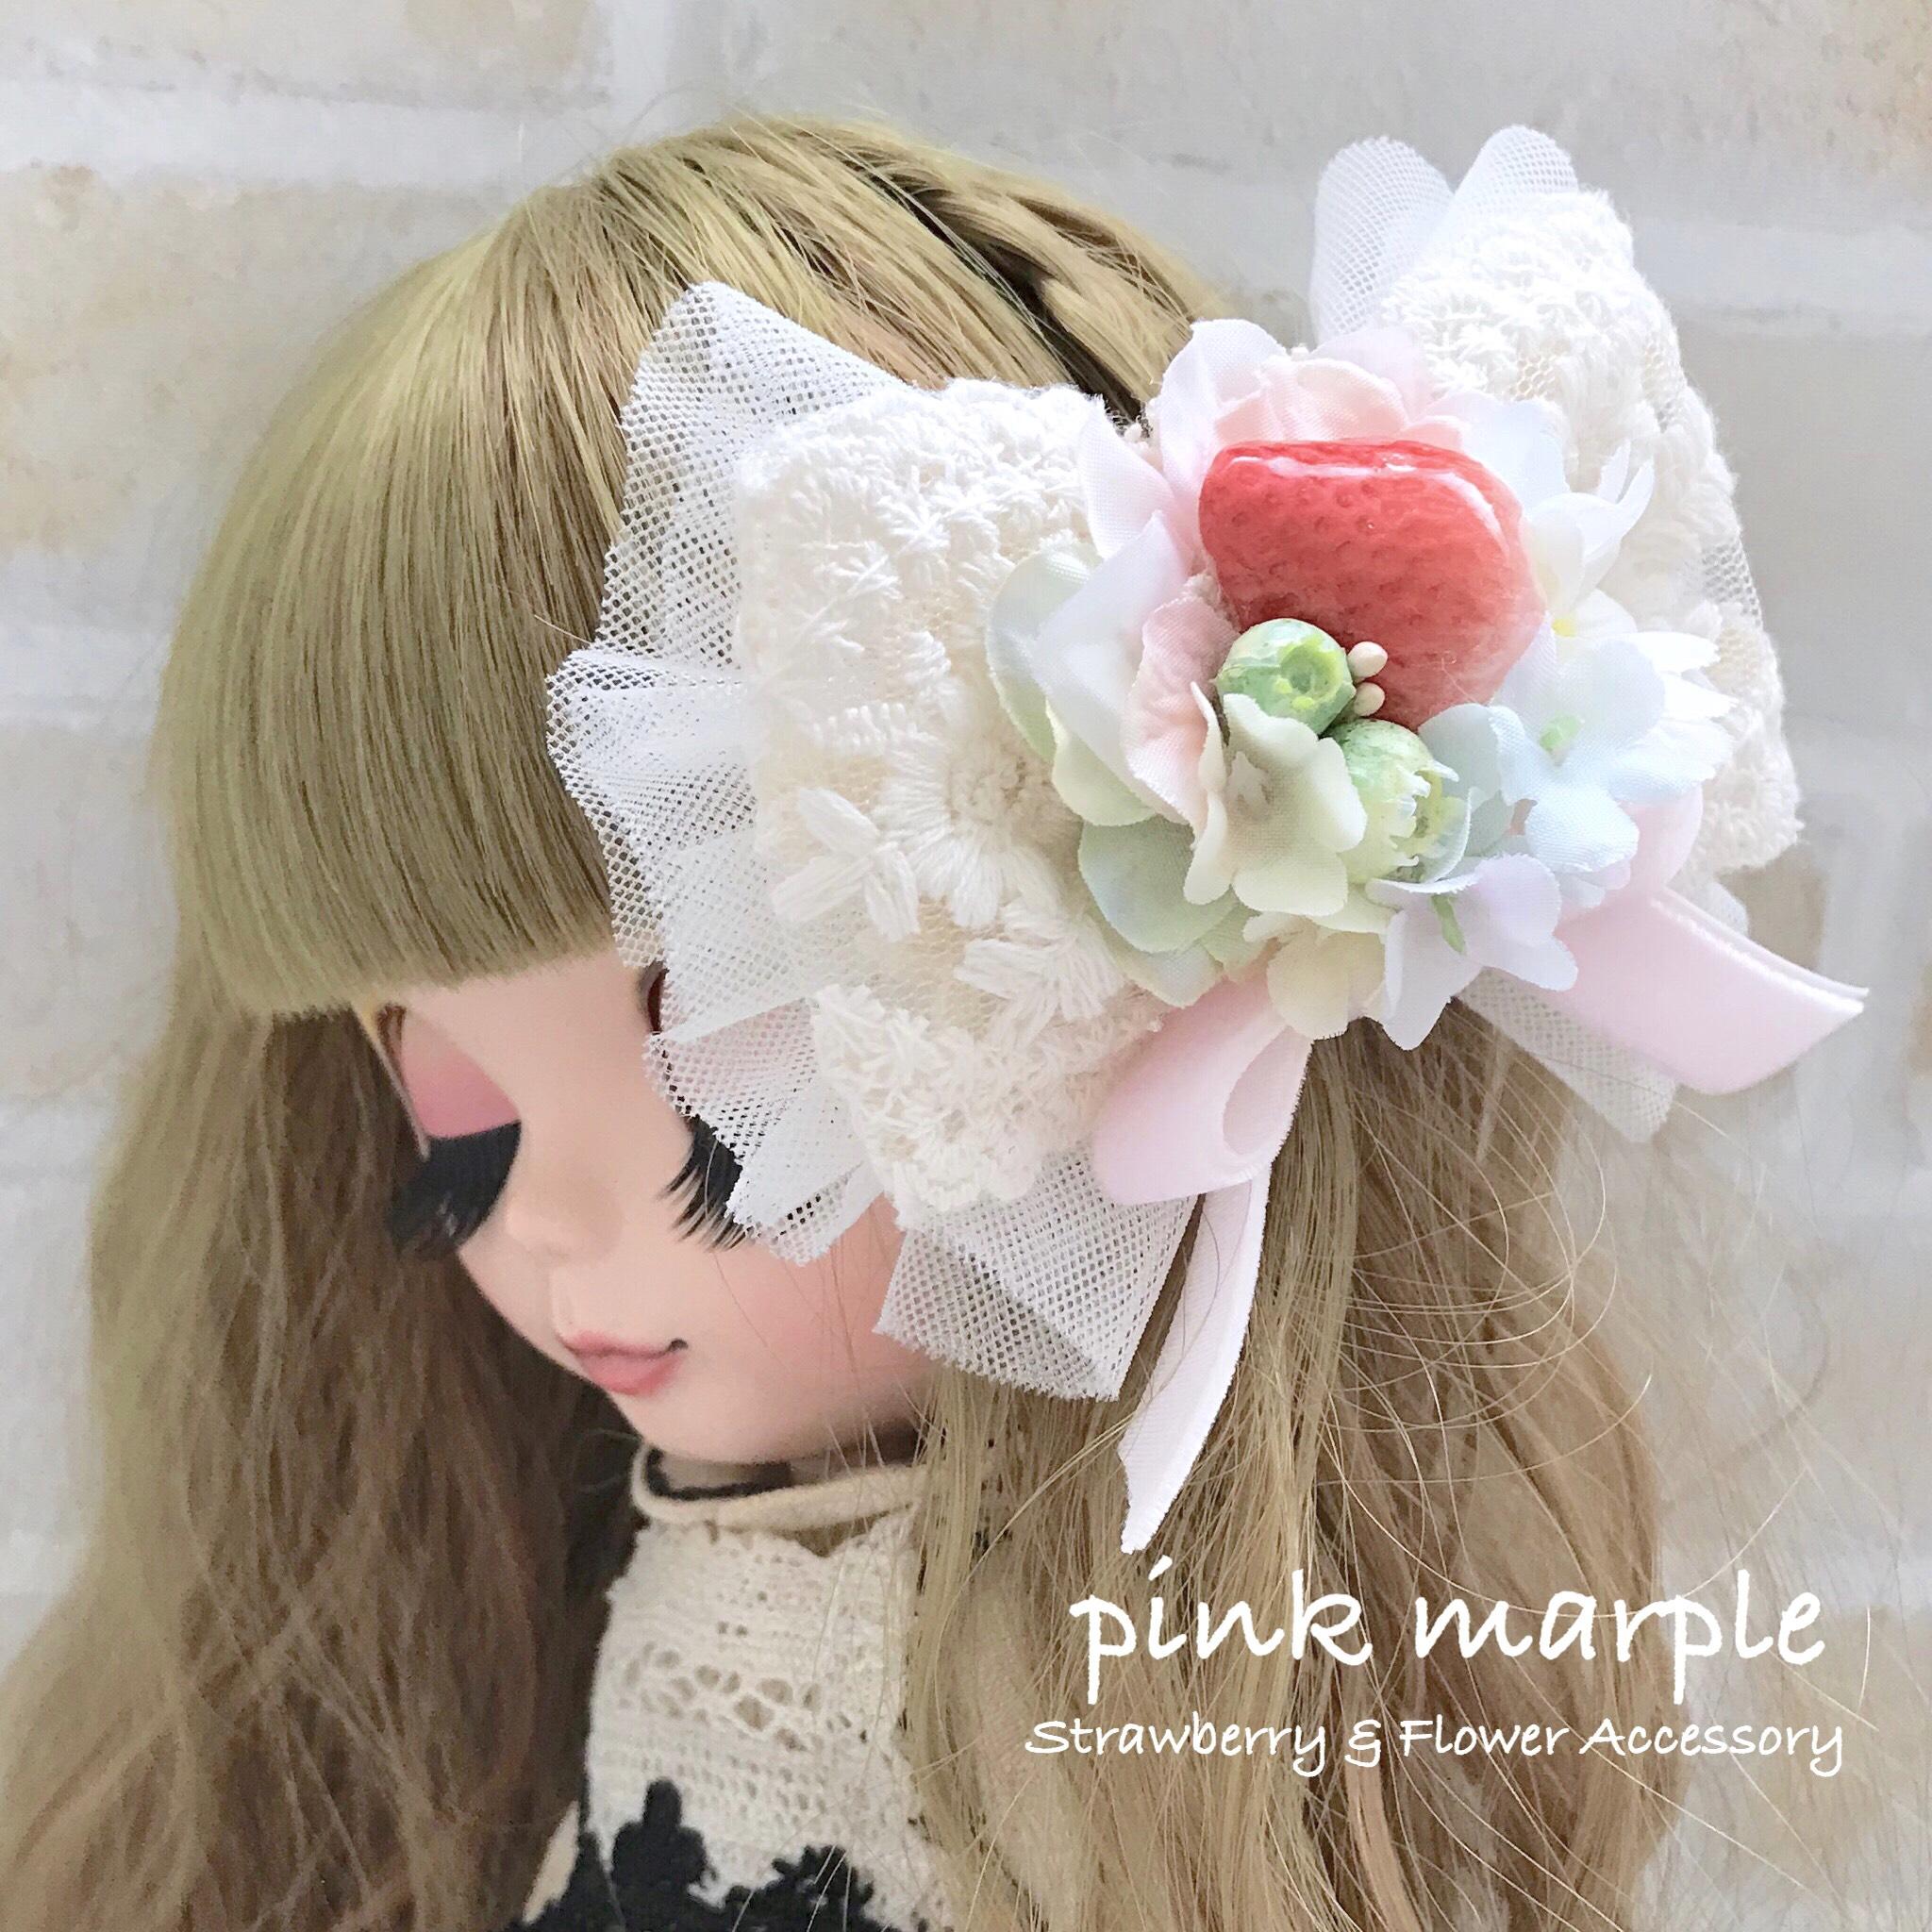 pink marple